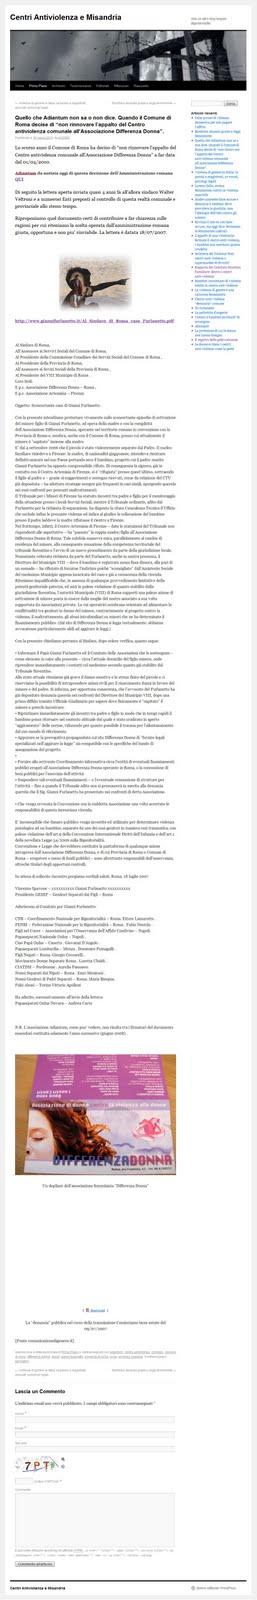 http://3.bp.blogspot.com/-EYjytzSX-hU/TZRA57nNFFI/AAAAAAAABZo/GPlVNQERR5U/s1600/Adiantum_pregiudicati.jpg